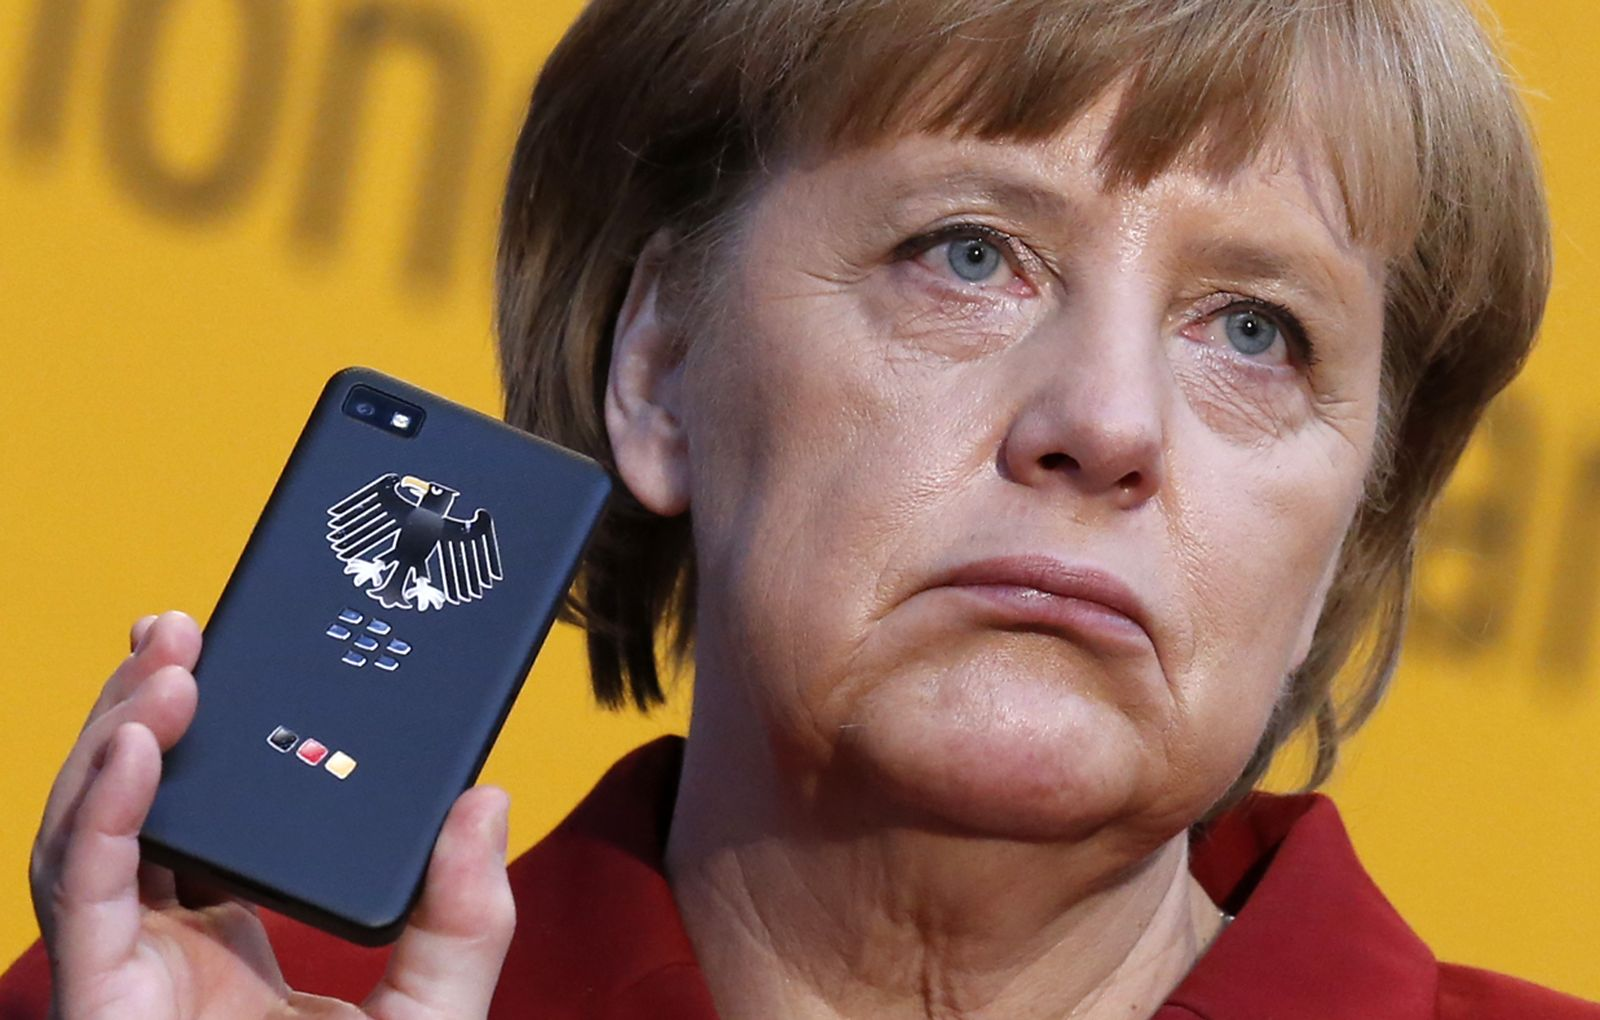 Angela Merkel / CeBIT